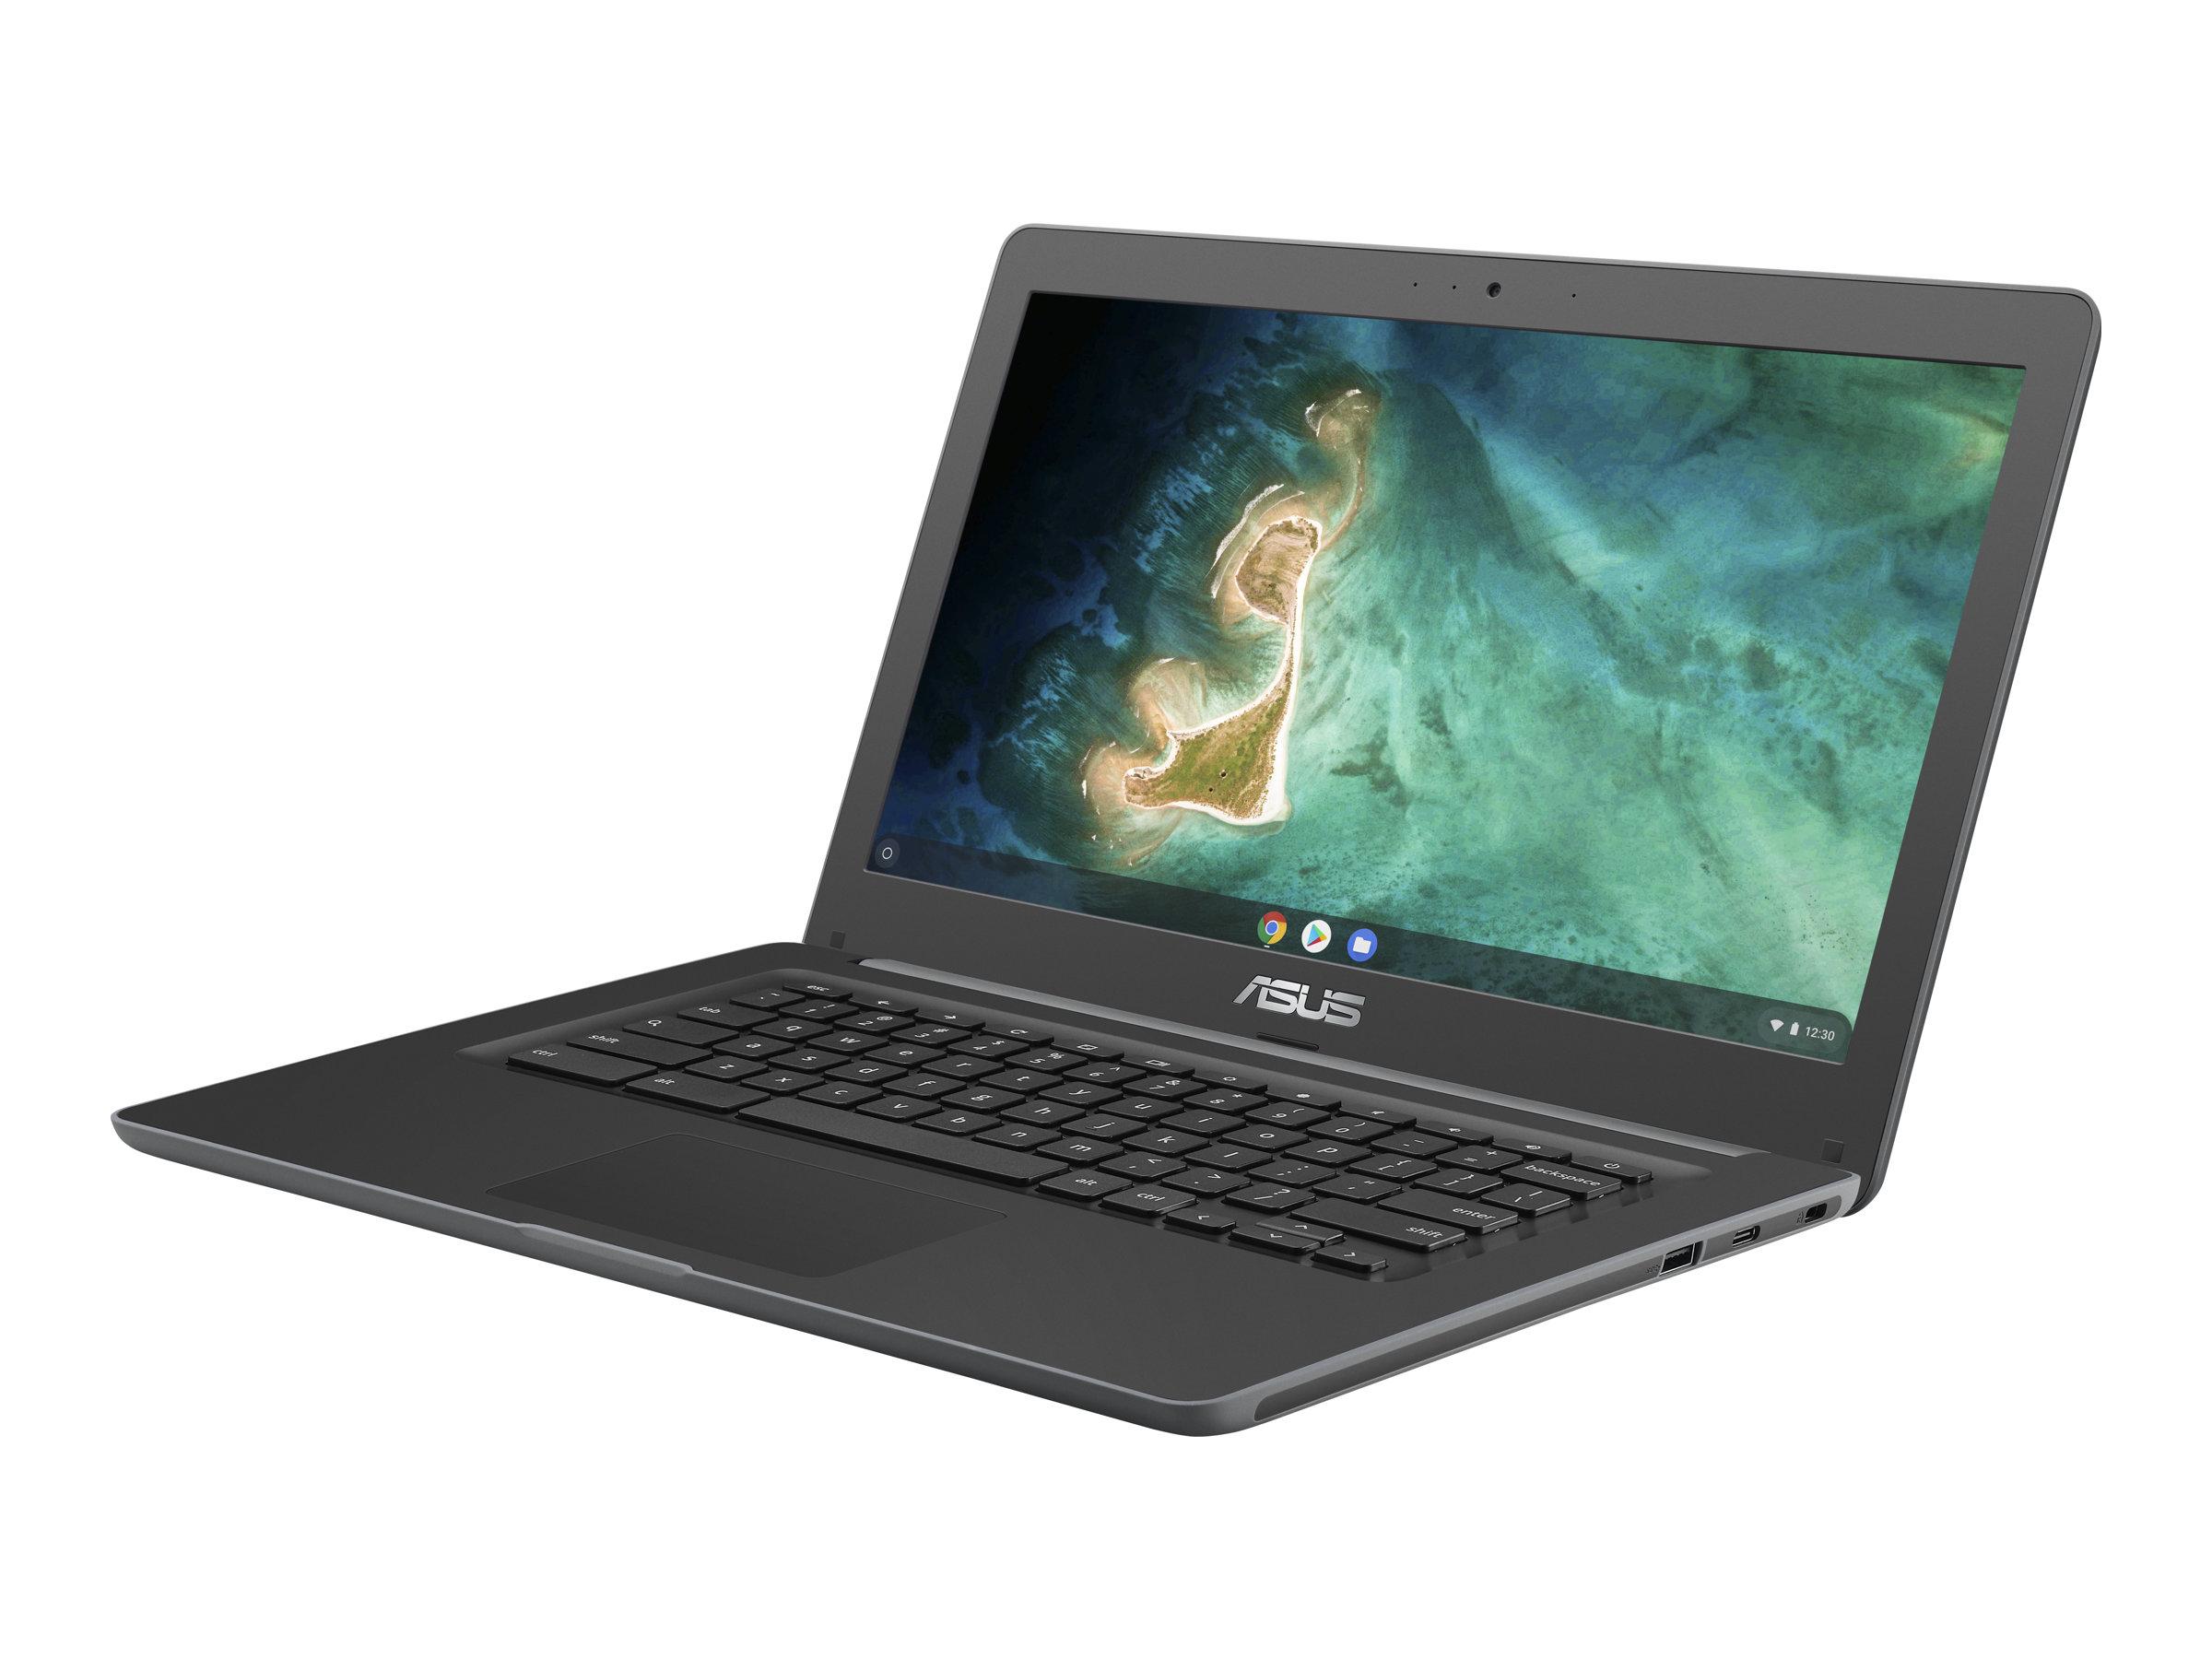 ASUS Chromebook C403NA FQ0045 - 180? Scharnier - Celeron N3350 / 1.1 GHz - Chrome OS - 4 GB RAM - 32 GB eMMC - 35.6 cm (